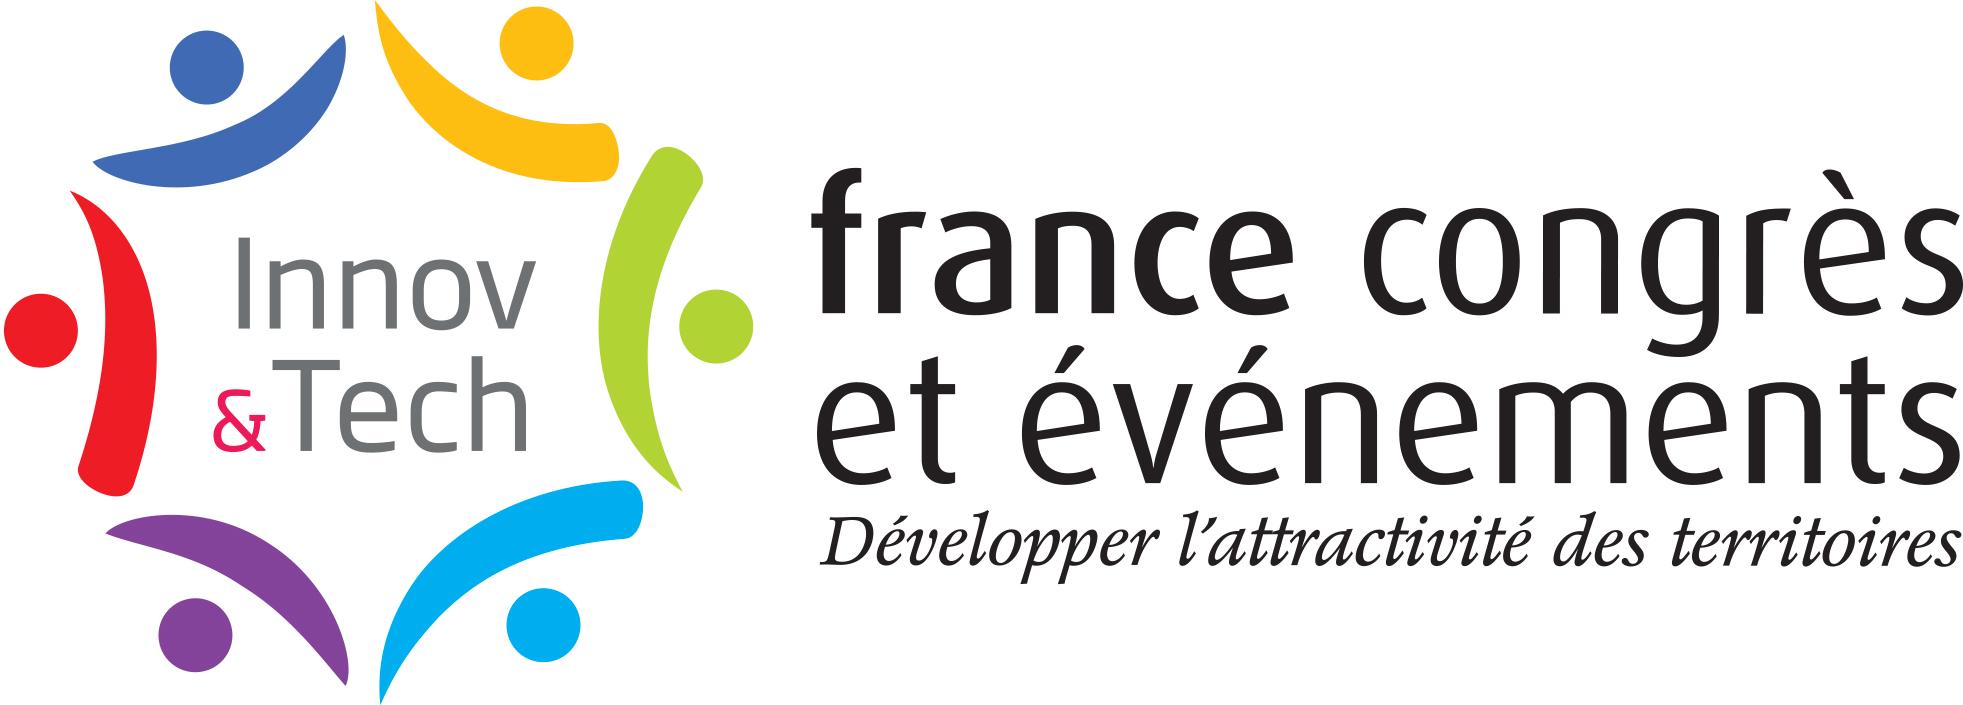 Francecongresnouveaulogo2017cmjnhorizontalinnov1497274478149727447815051182271505118227